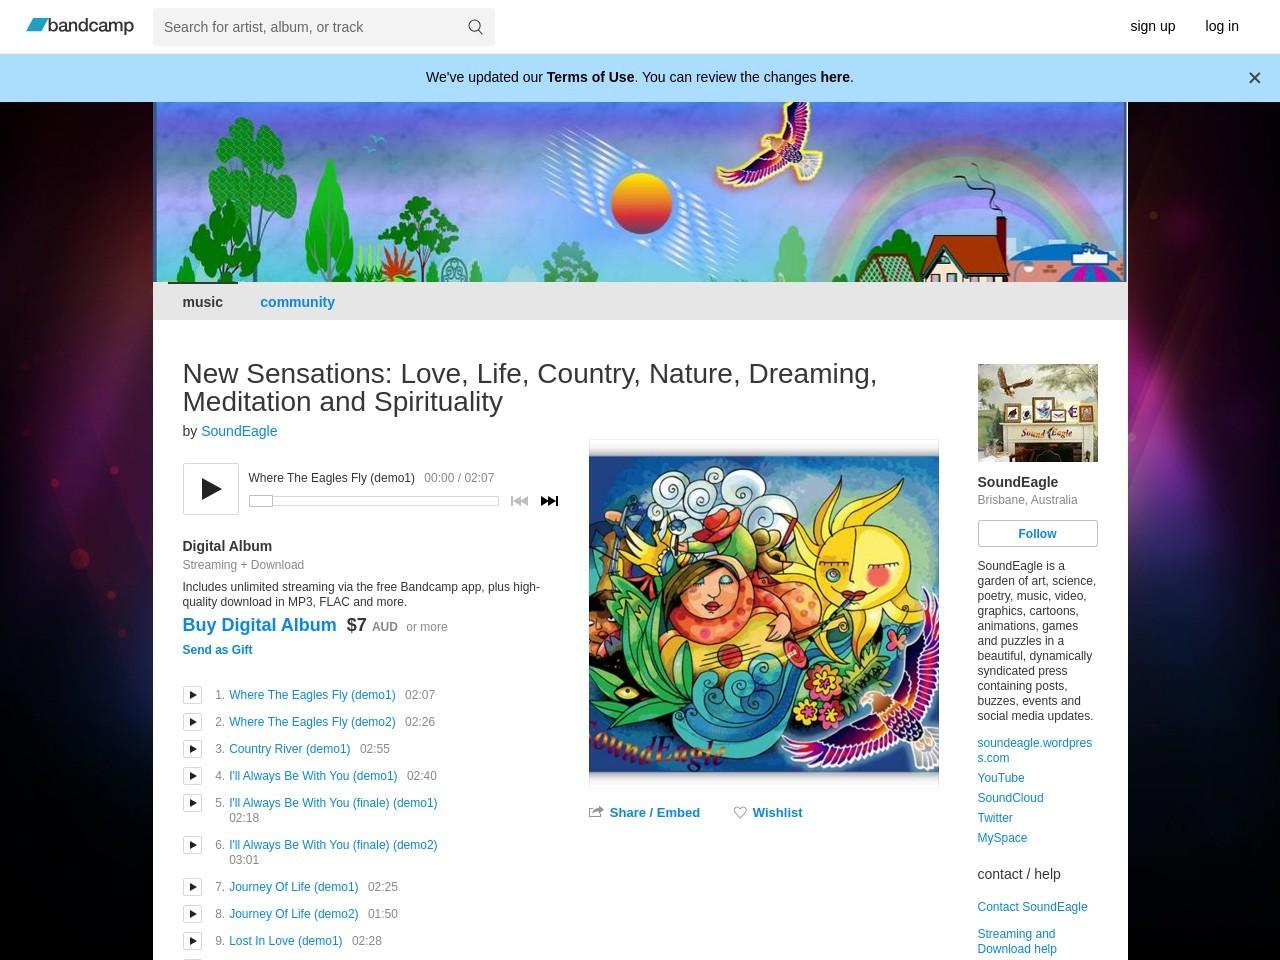 SoundEagle on BandCamp